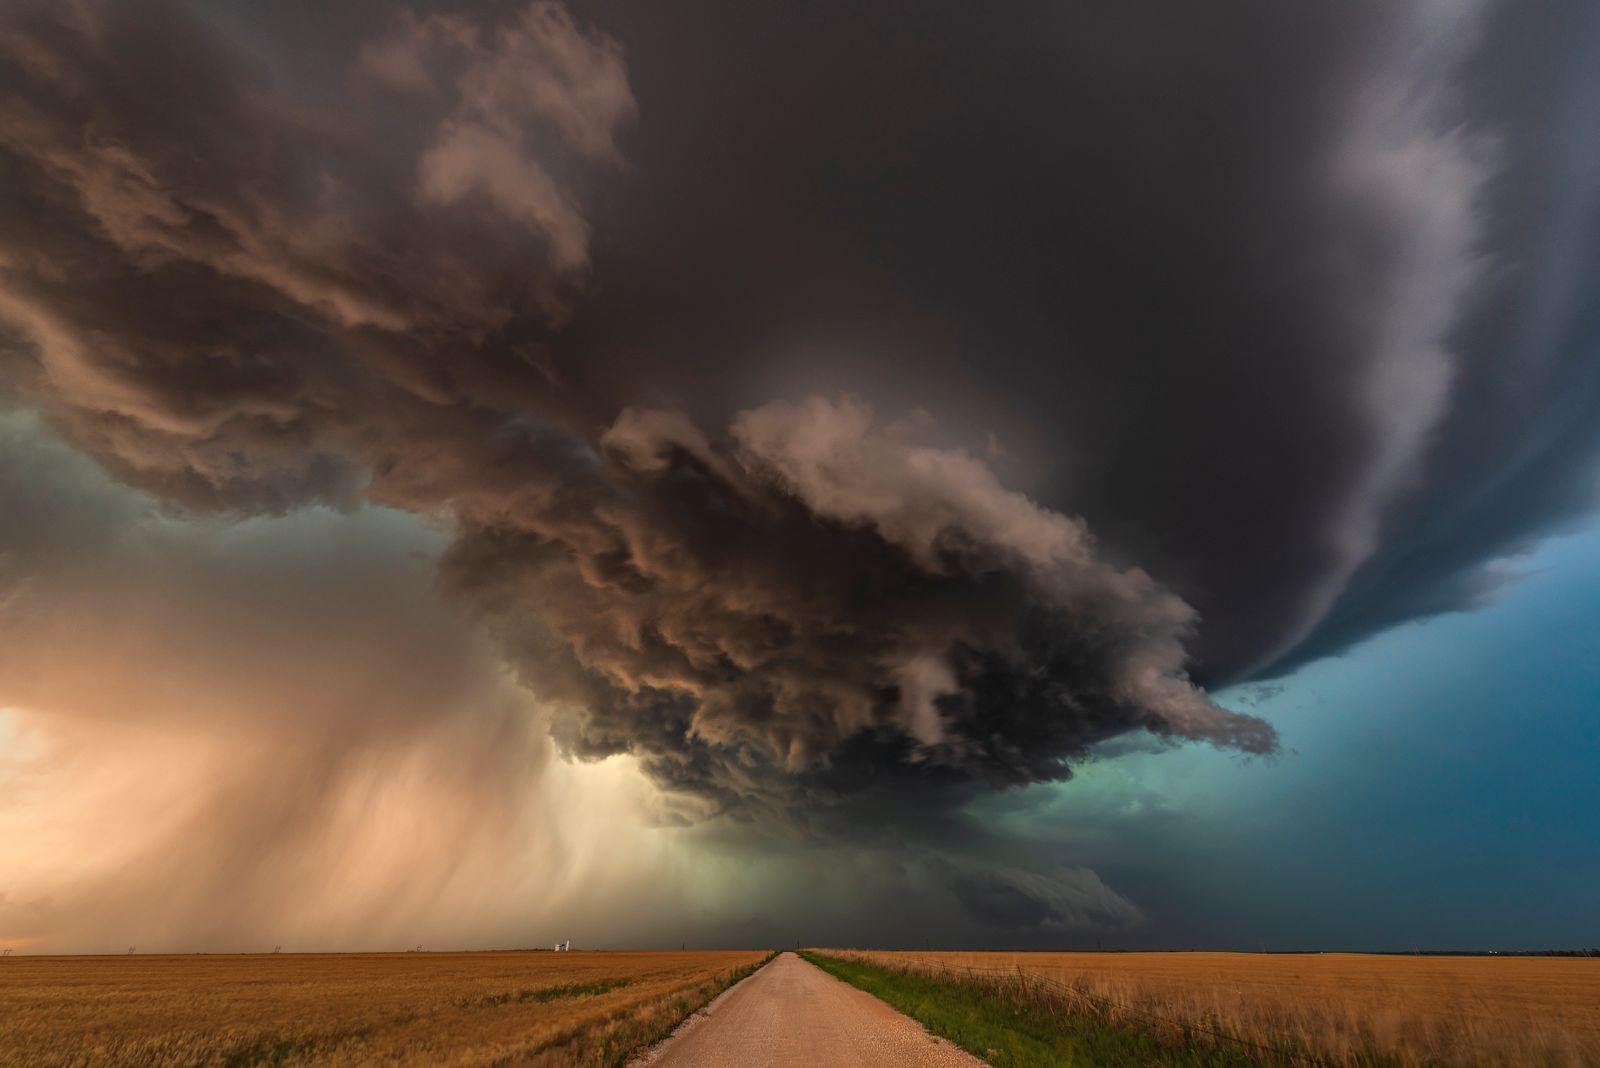 Tornado warned storm pt2, Oklahoma. USA 2018